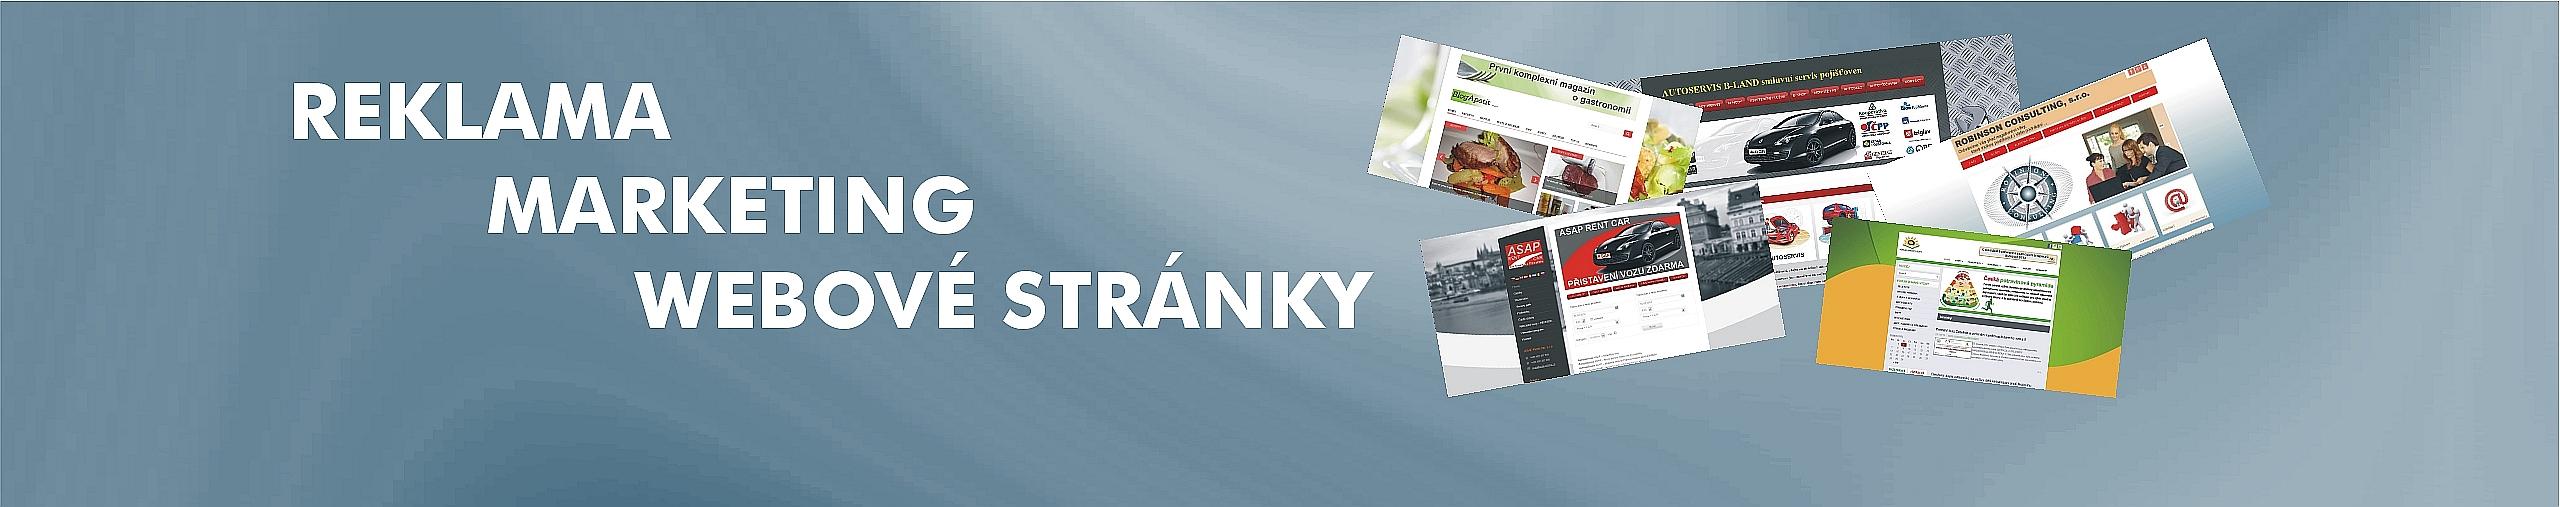 Reklama, marketing, webové stránky